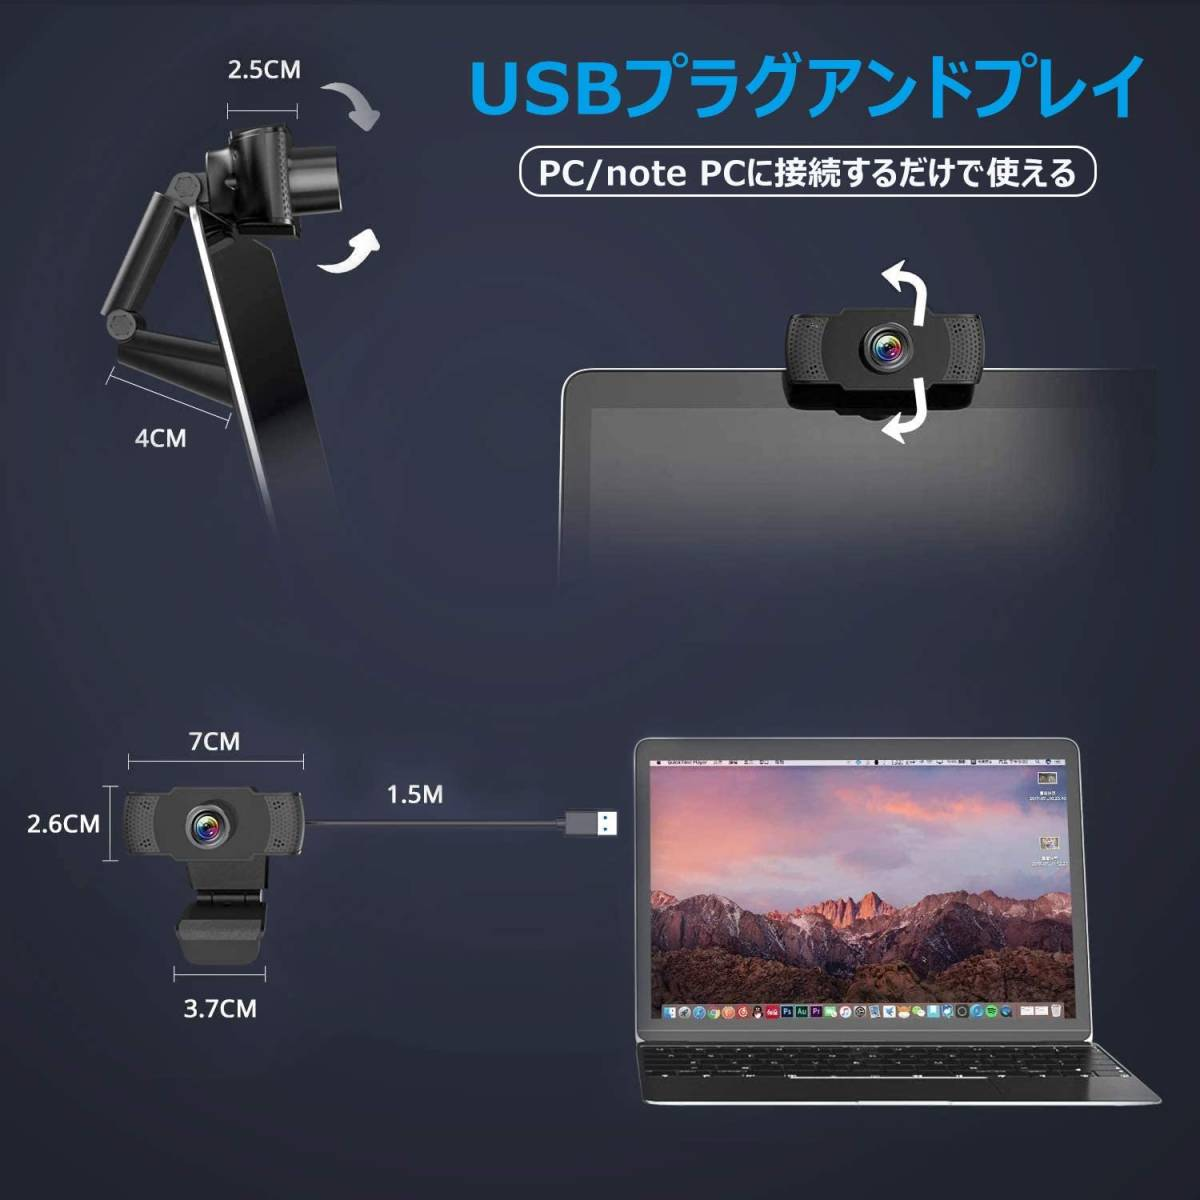 webカメラ ウェブカメラ き USBカメラフルHD1080P/30fps 100°広角 Webカメラ 200万画素 パソコンカメラ PCカメラ マイク内蔵